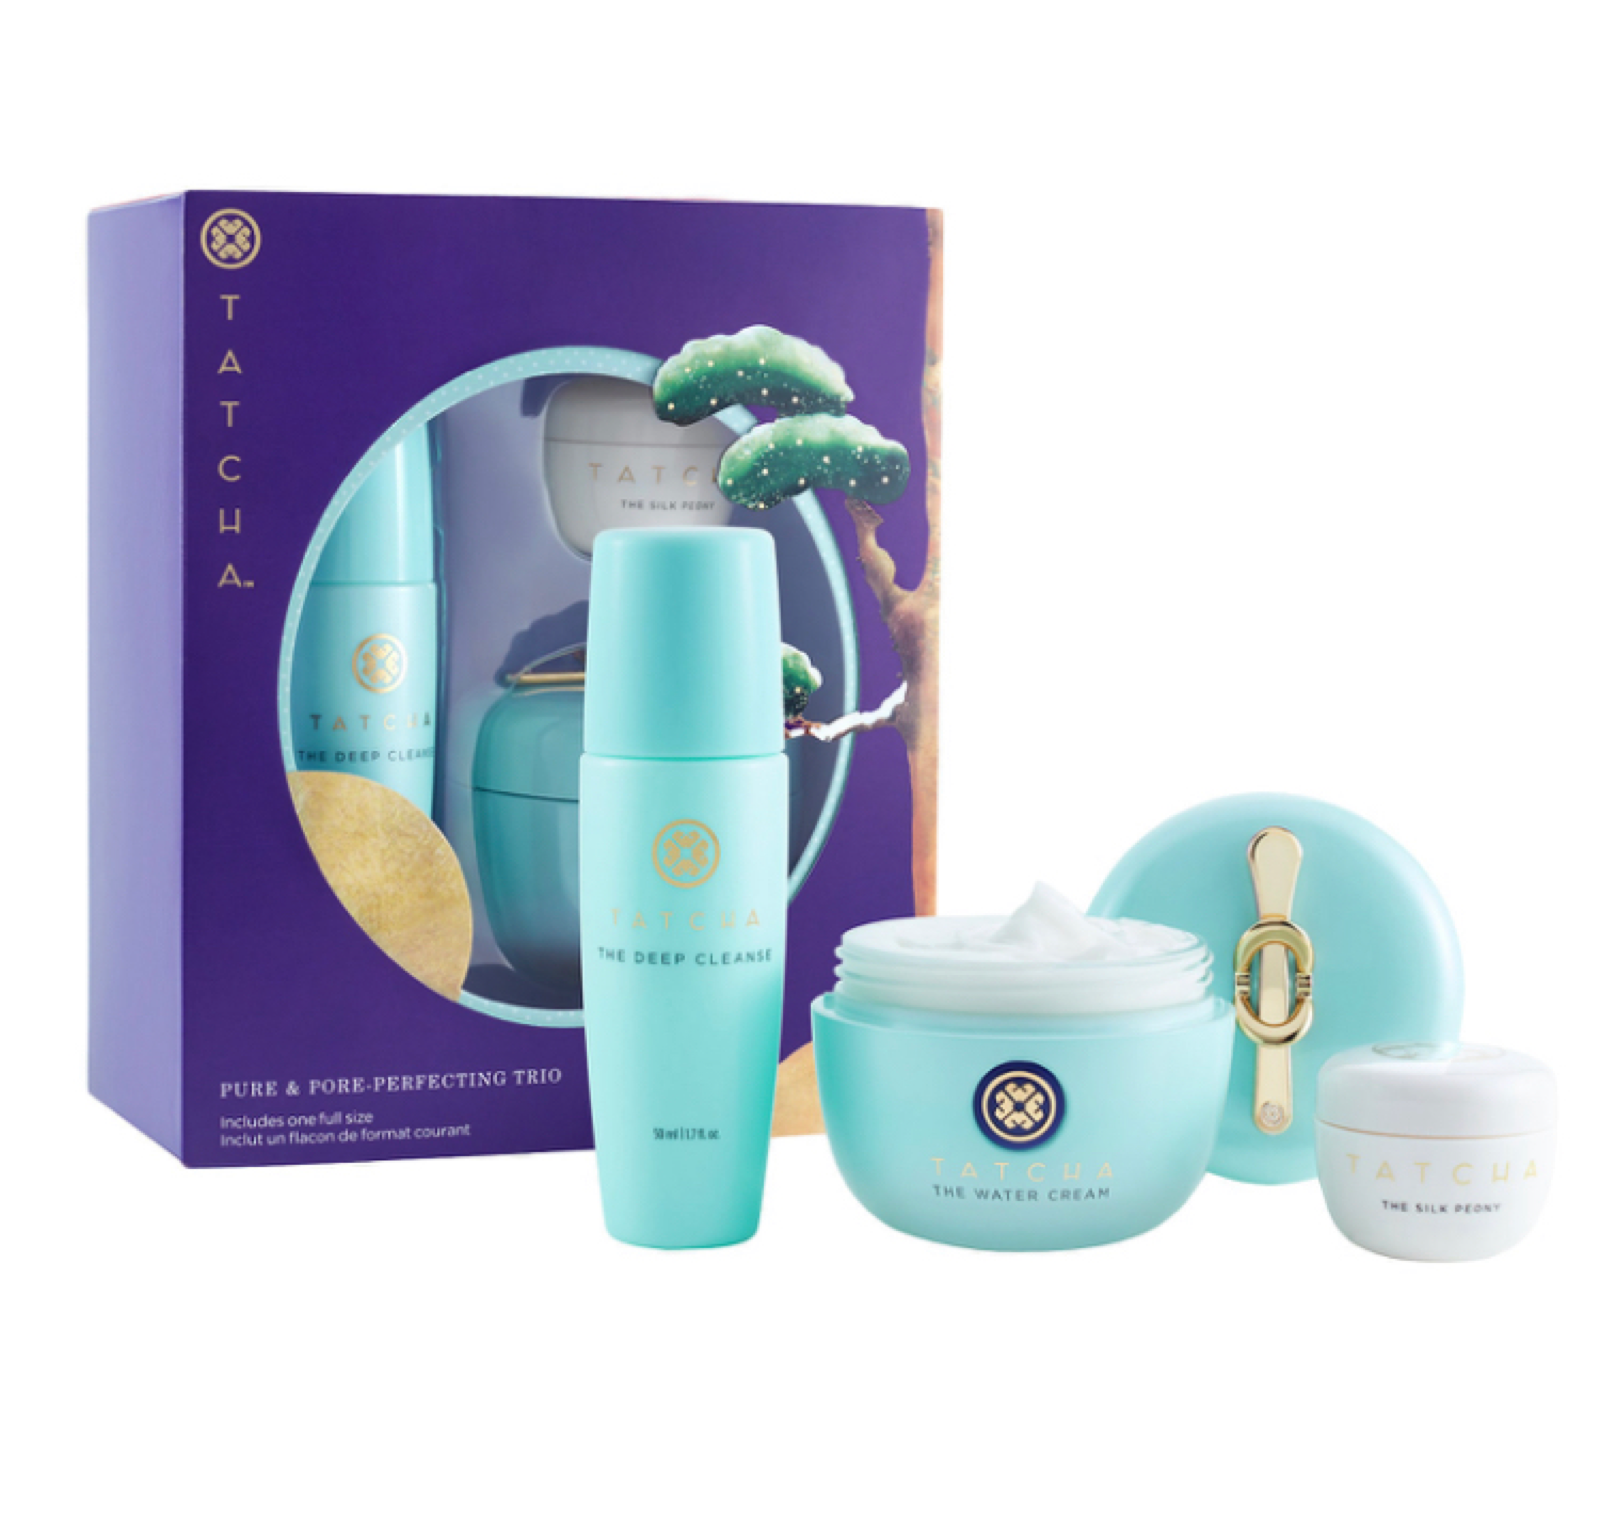 Tatcha Pure and Pore-Perfecting Trio Gift Set | Holiday 2020